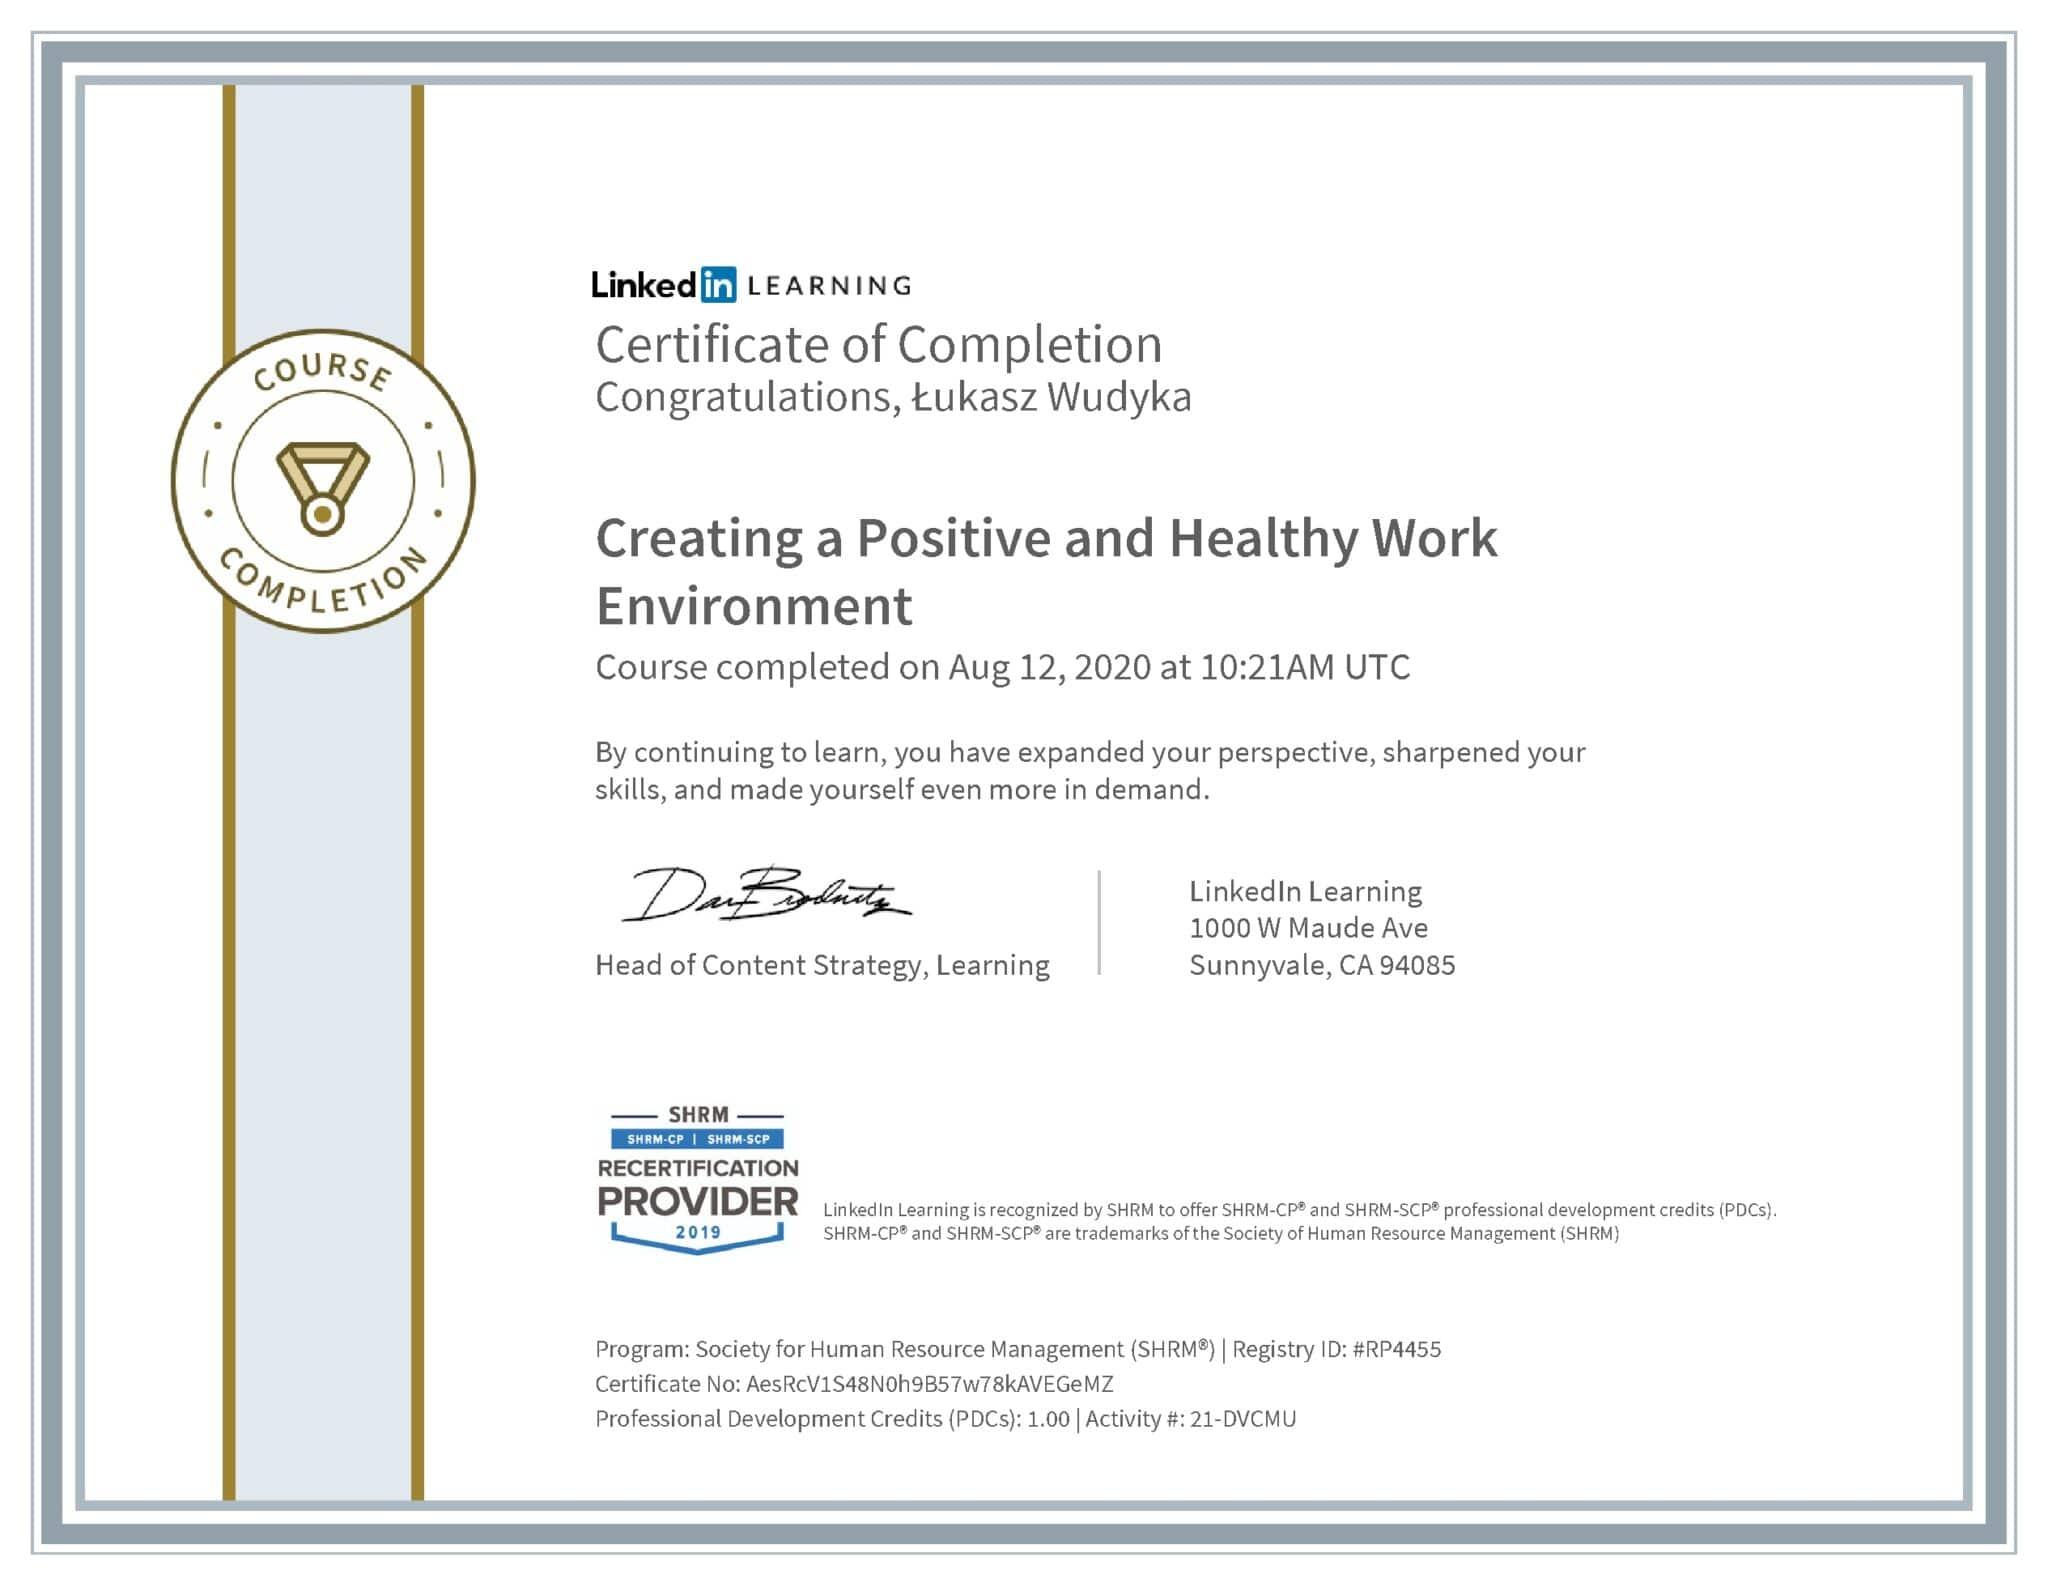 Łukasz Wudyka certyfikat LinkedIn Creating a Positive and Healthy Work Environment SHRM